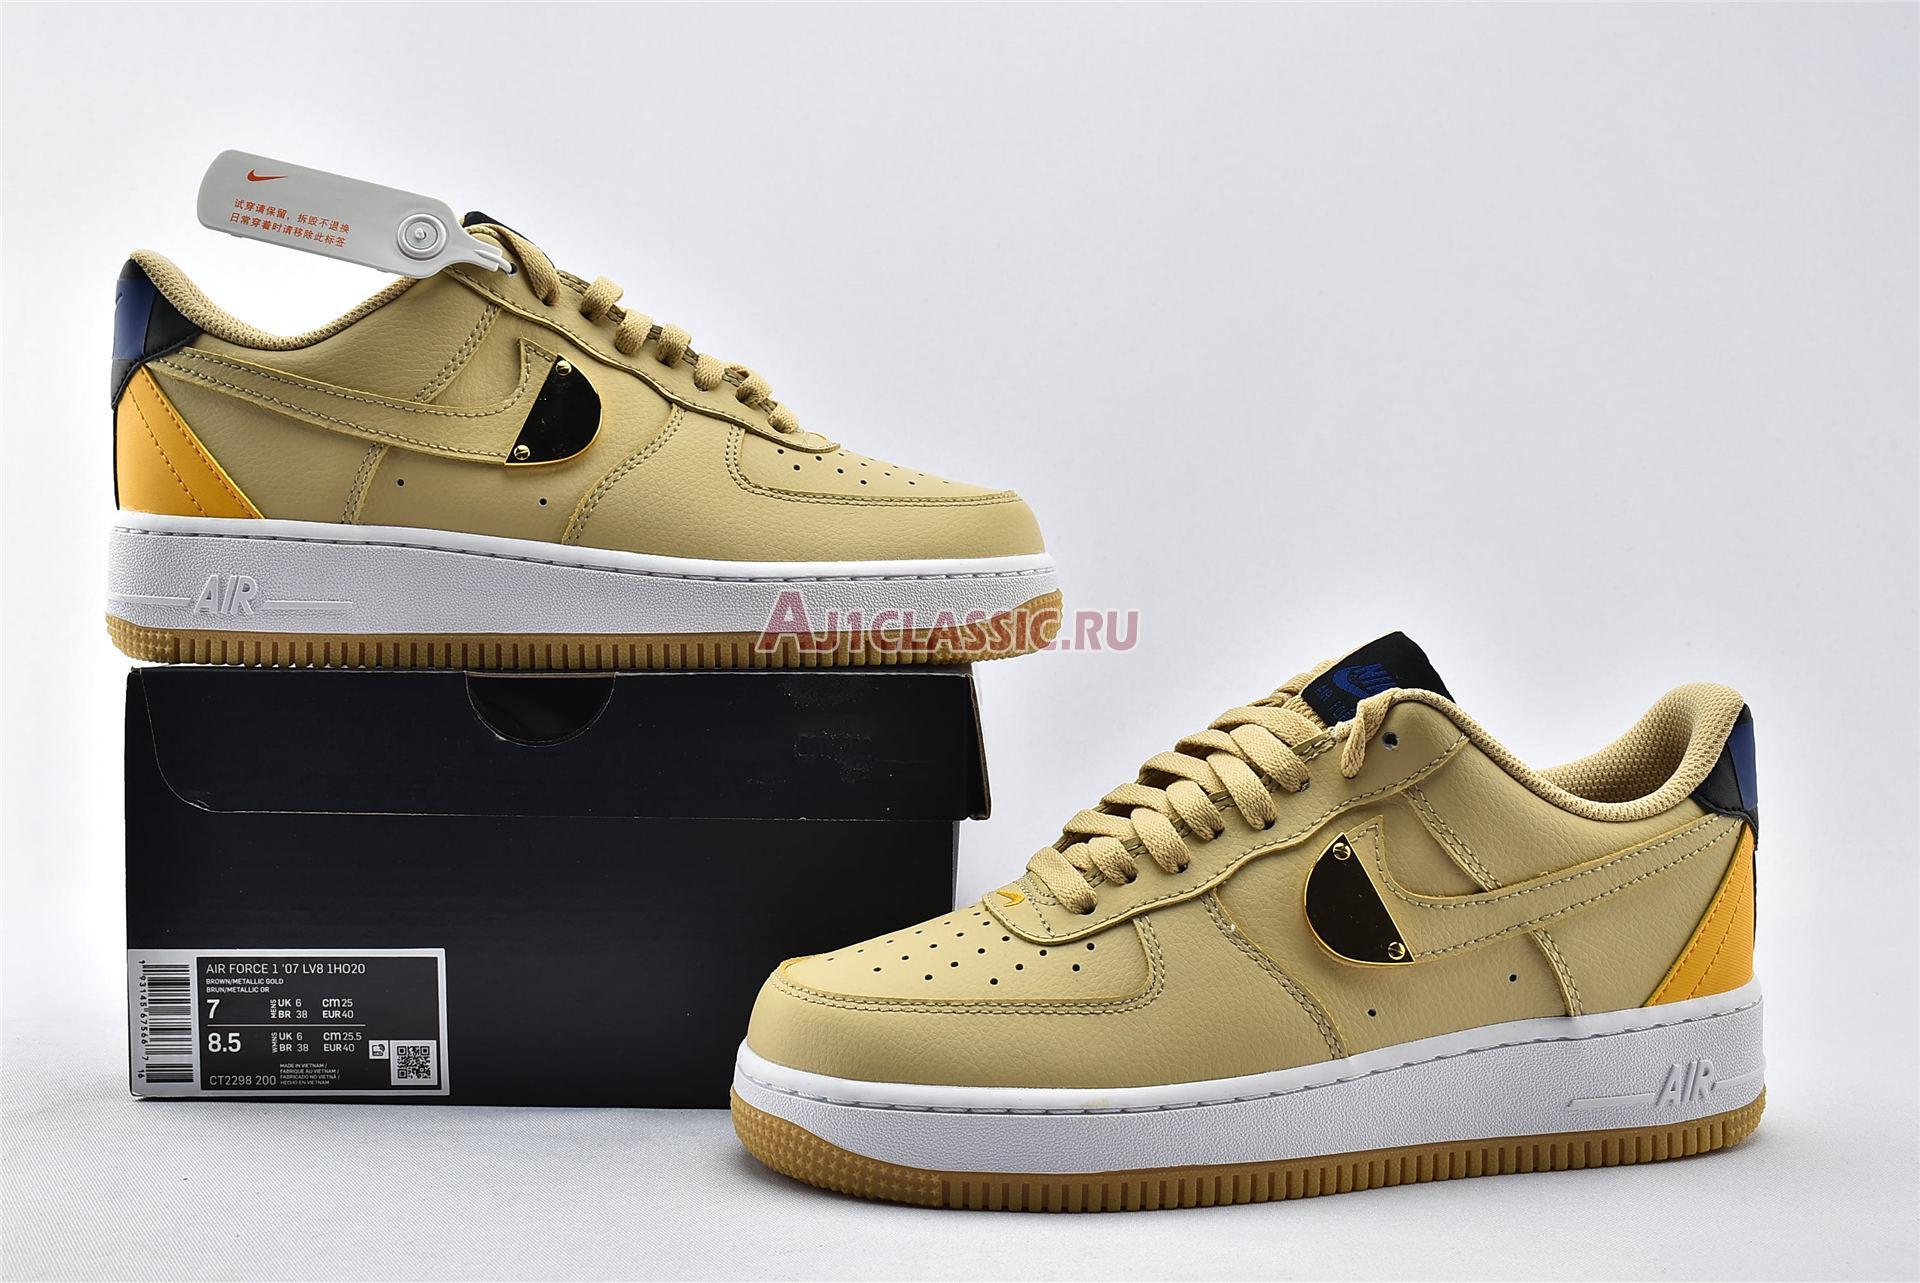 "NBA x Air Force 1 07 LV8 ""Sesame University Gold"" CT2298-200"